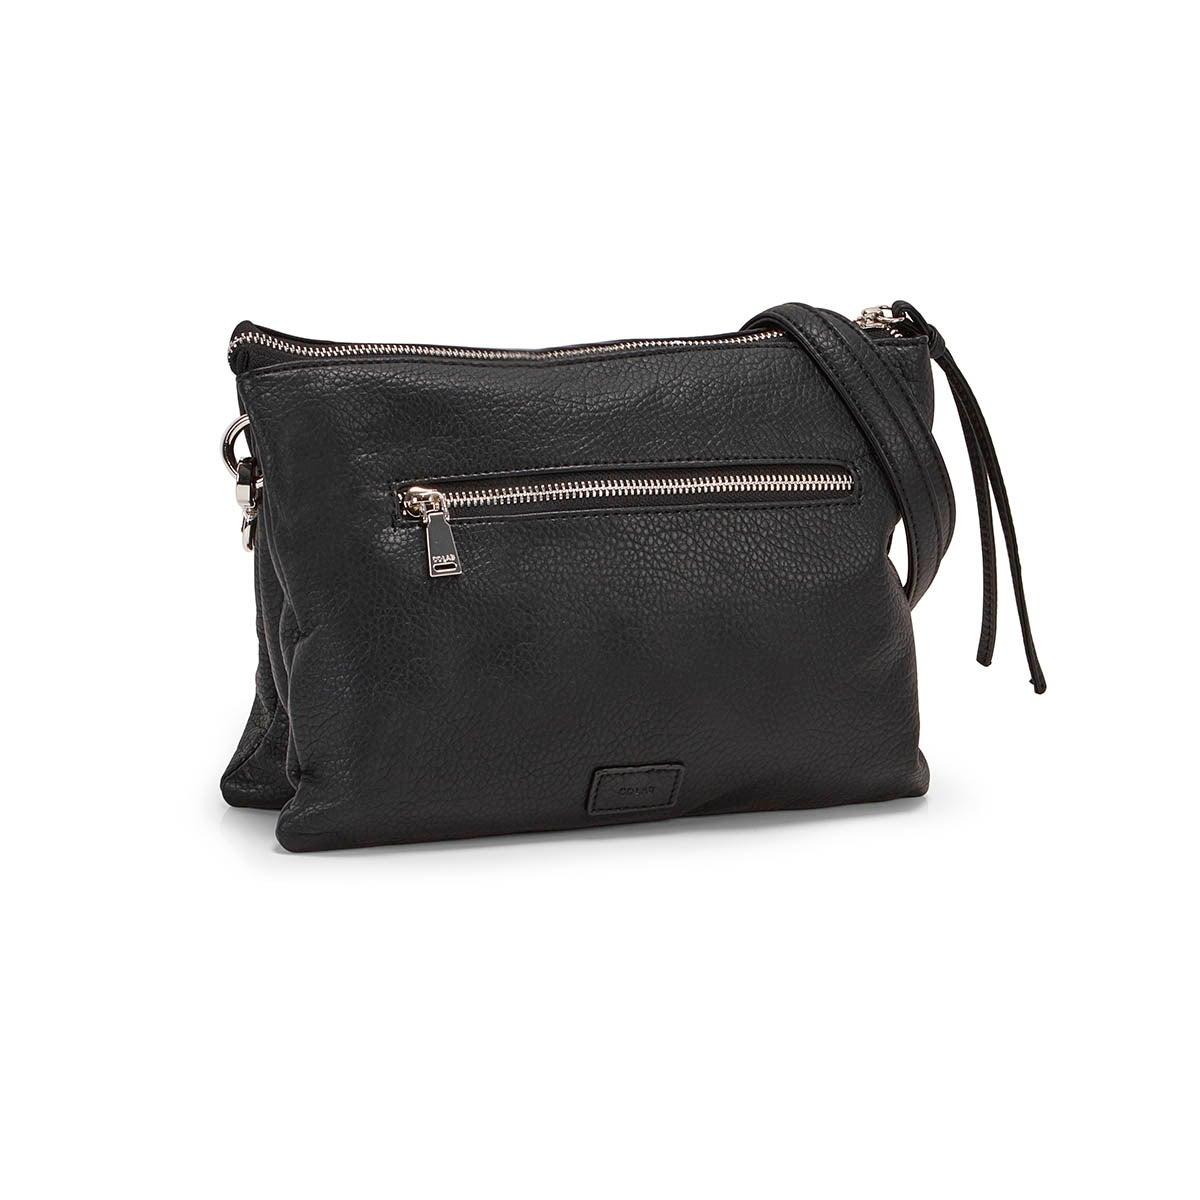 Lds black clutch crossbody bag